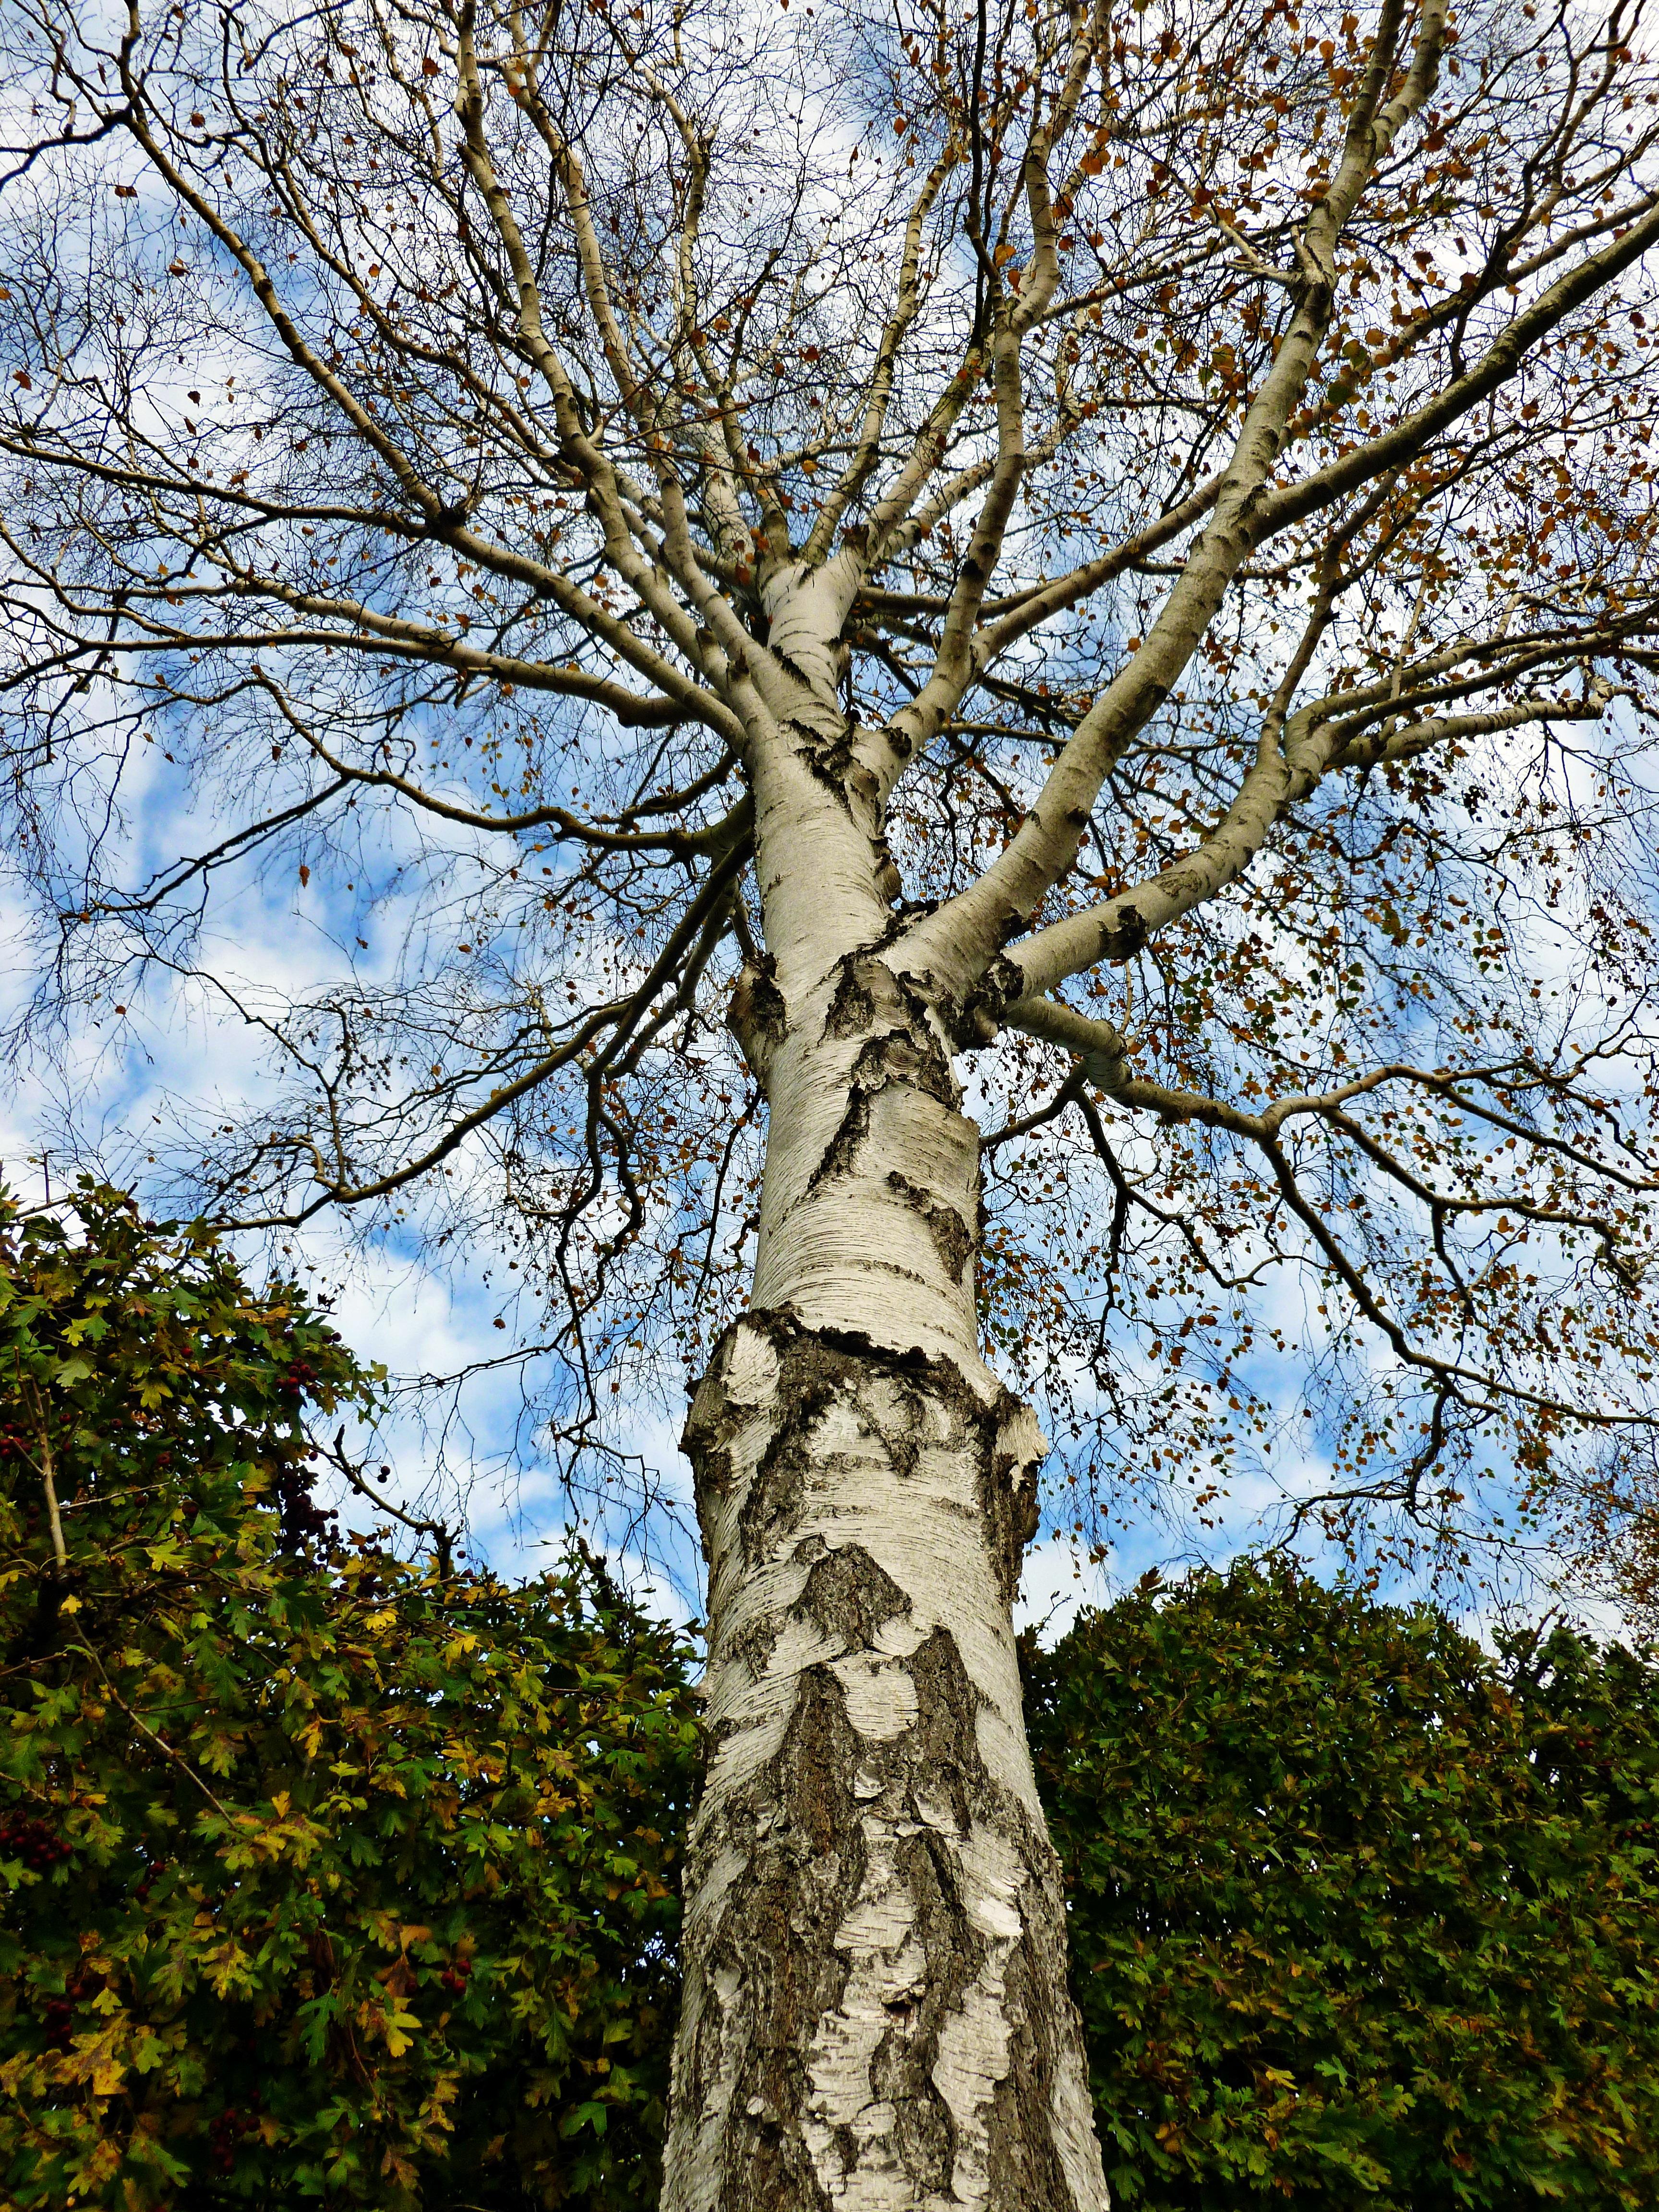 Fotos gratis : árbol, naturaleza, rama, madera, flor, el maletero ...